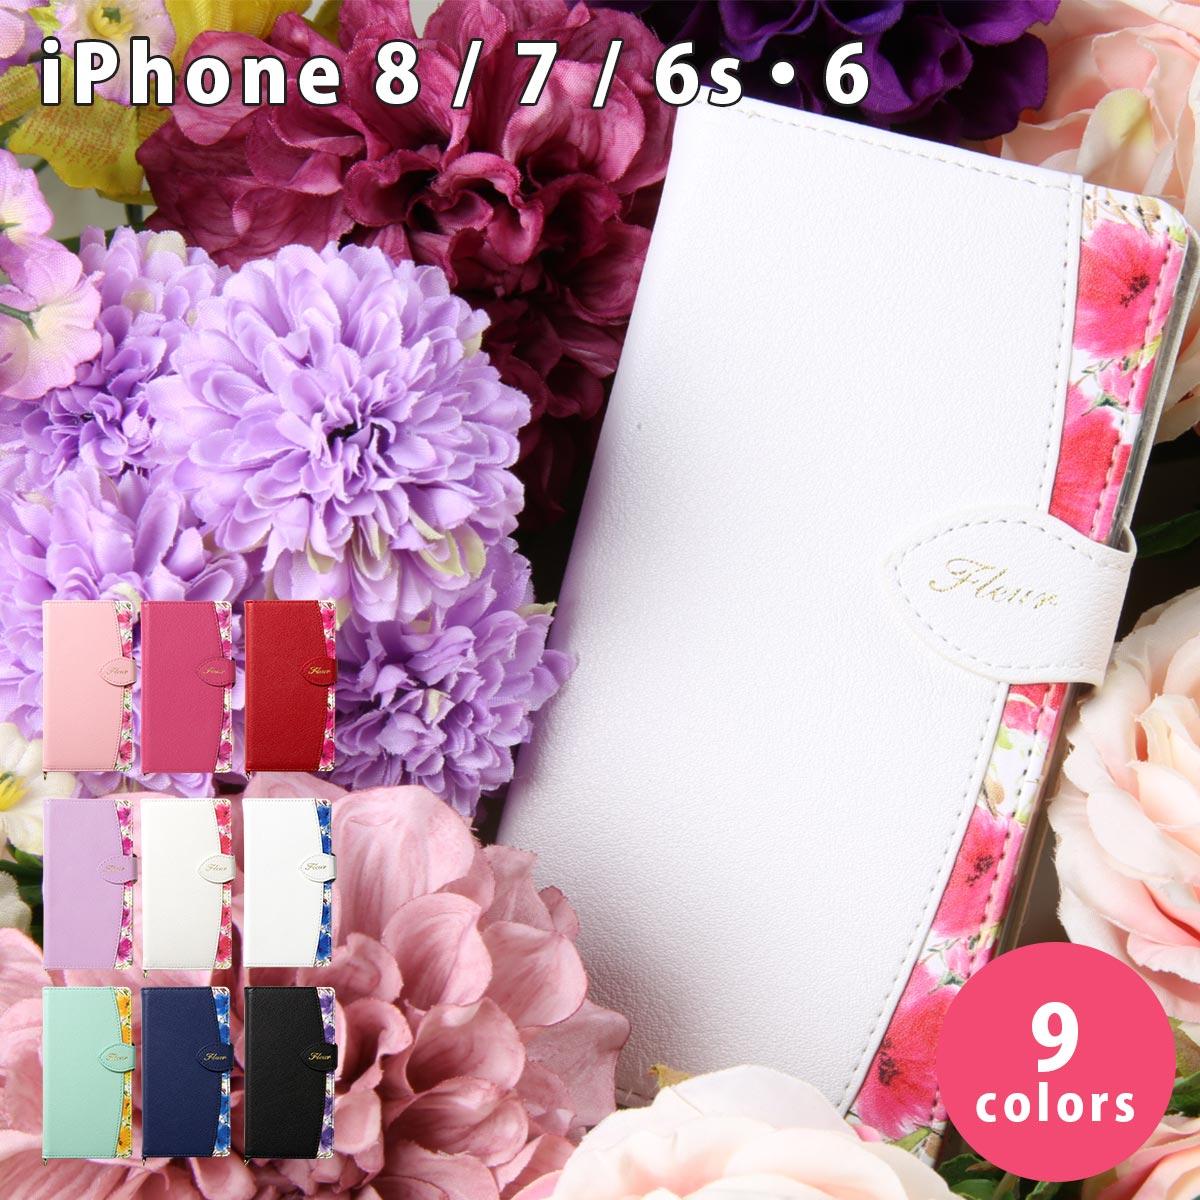 iPhone8 7 6 6s ケース 手帳型 スマホケース スマートフォン おしゃれ アイフォン 大人女子 ナチュラルデザイン NATURAL design FLEUR